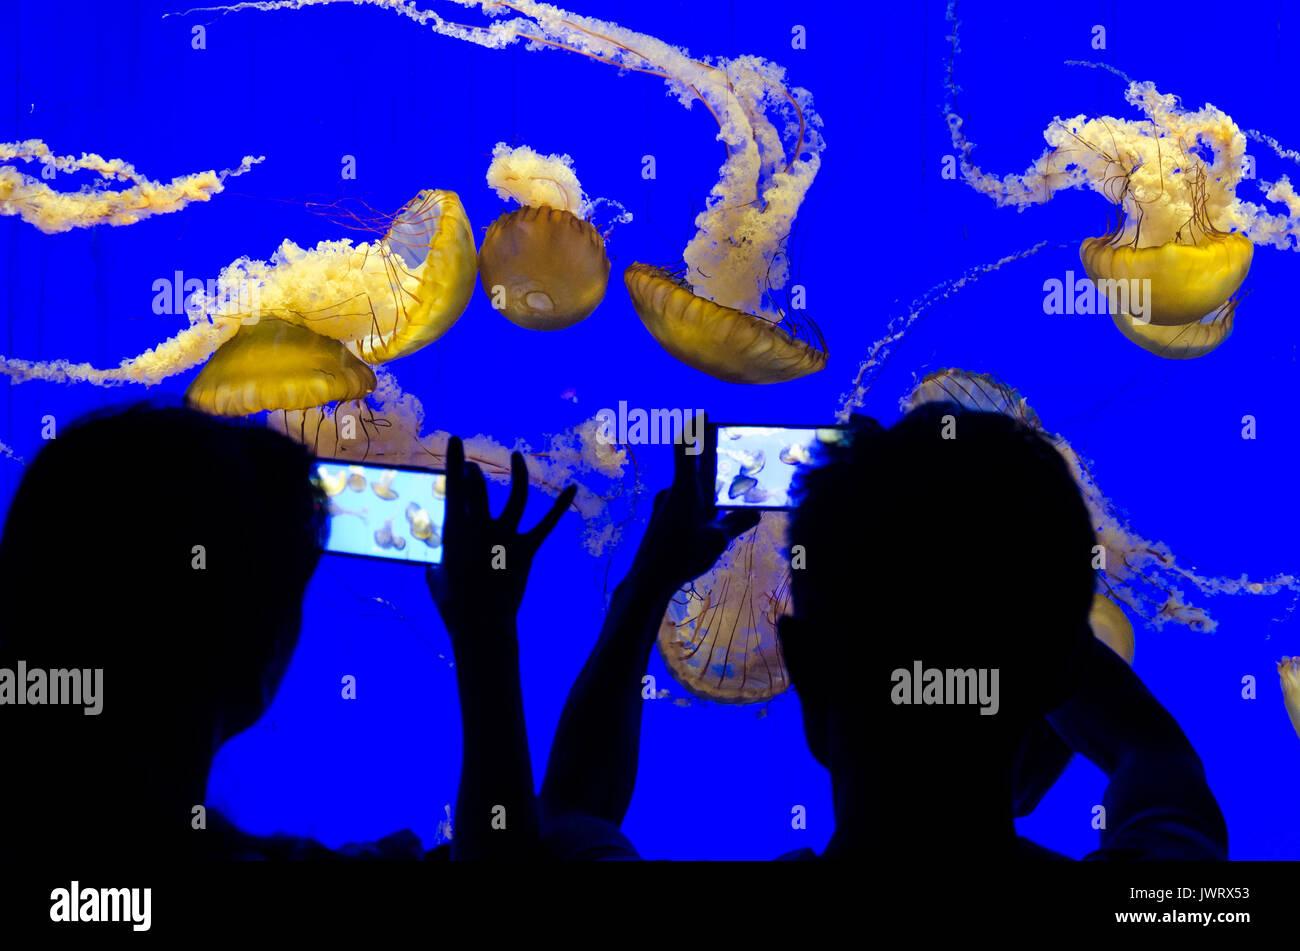 silhouettes-of-people-looking-at-a-tank-of-jellyfish-in-shanghai-aquarian-JWRX53.jpg